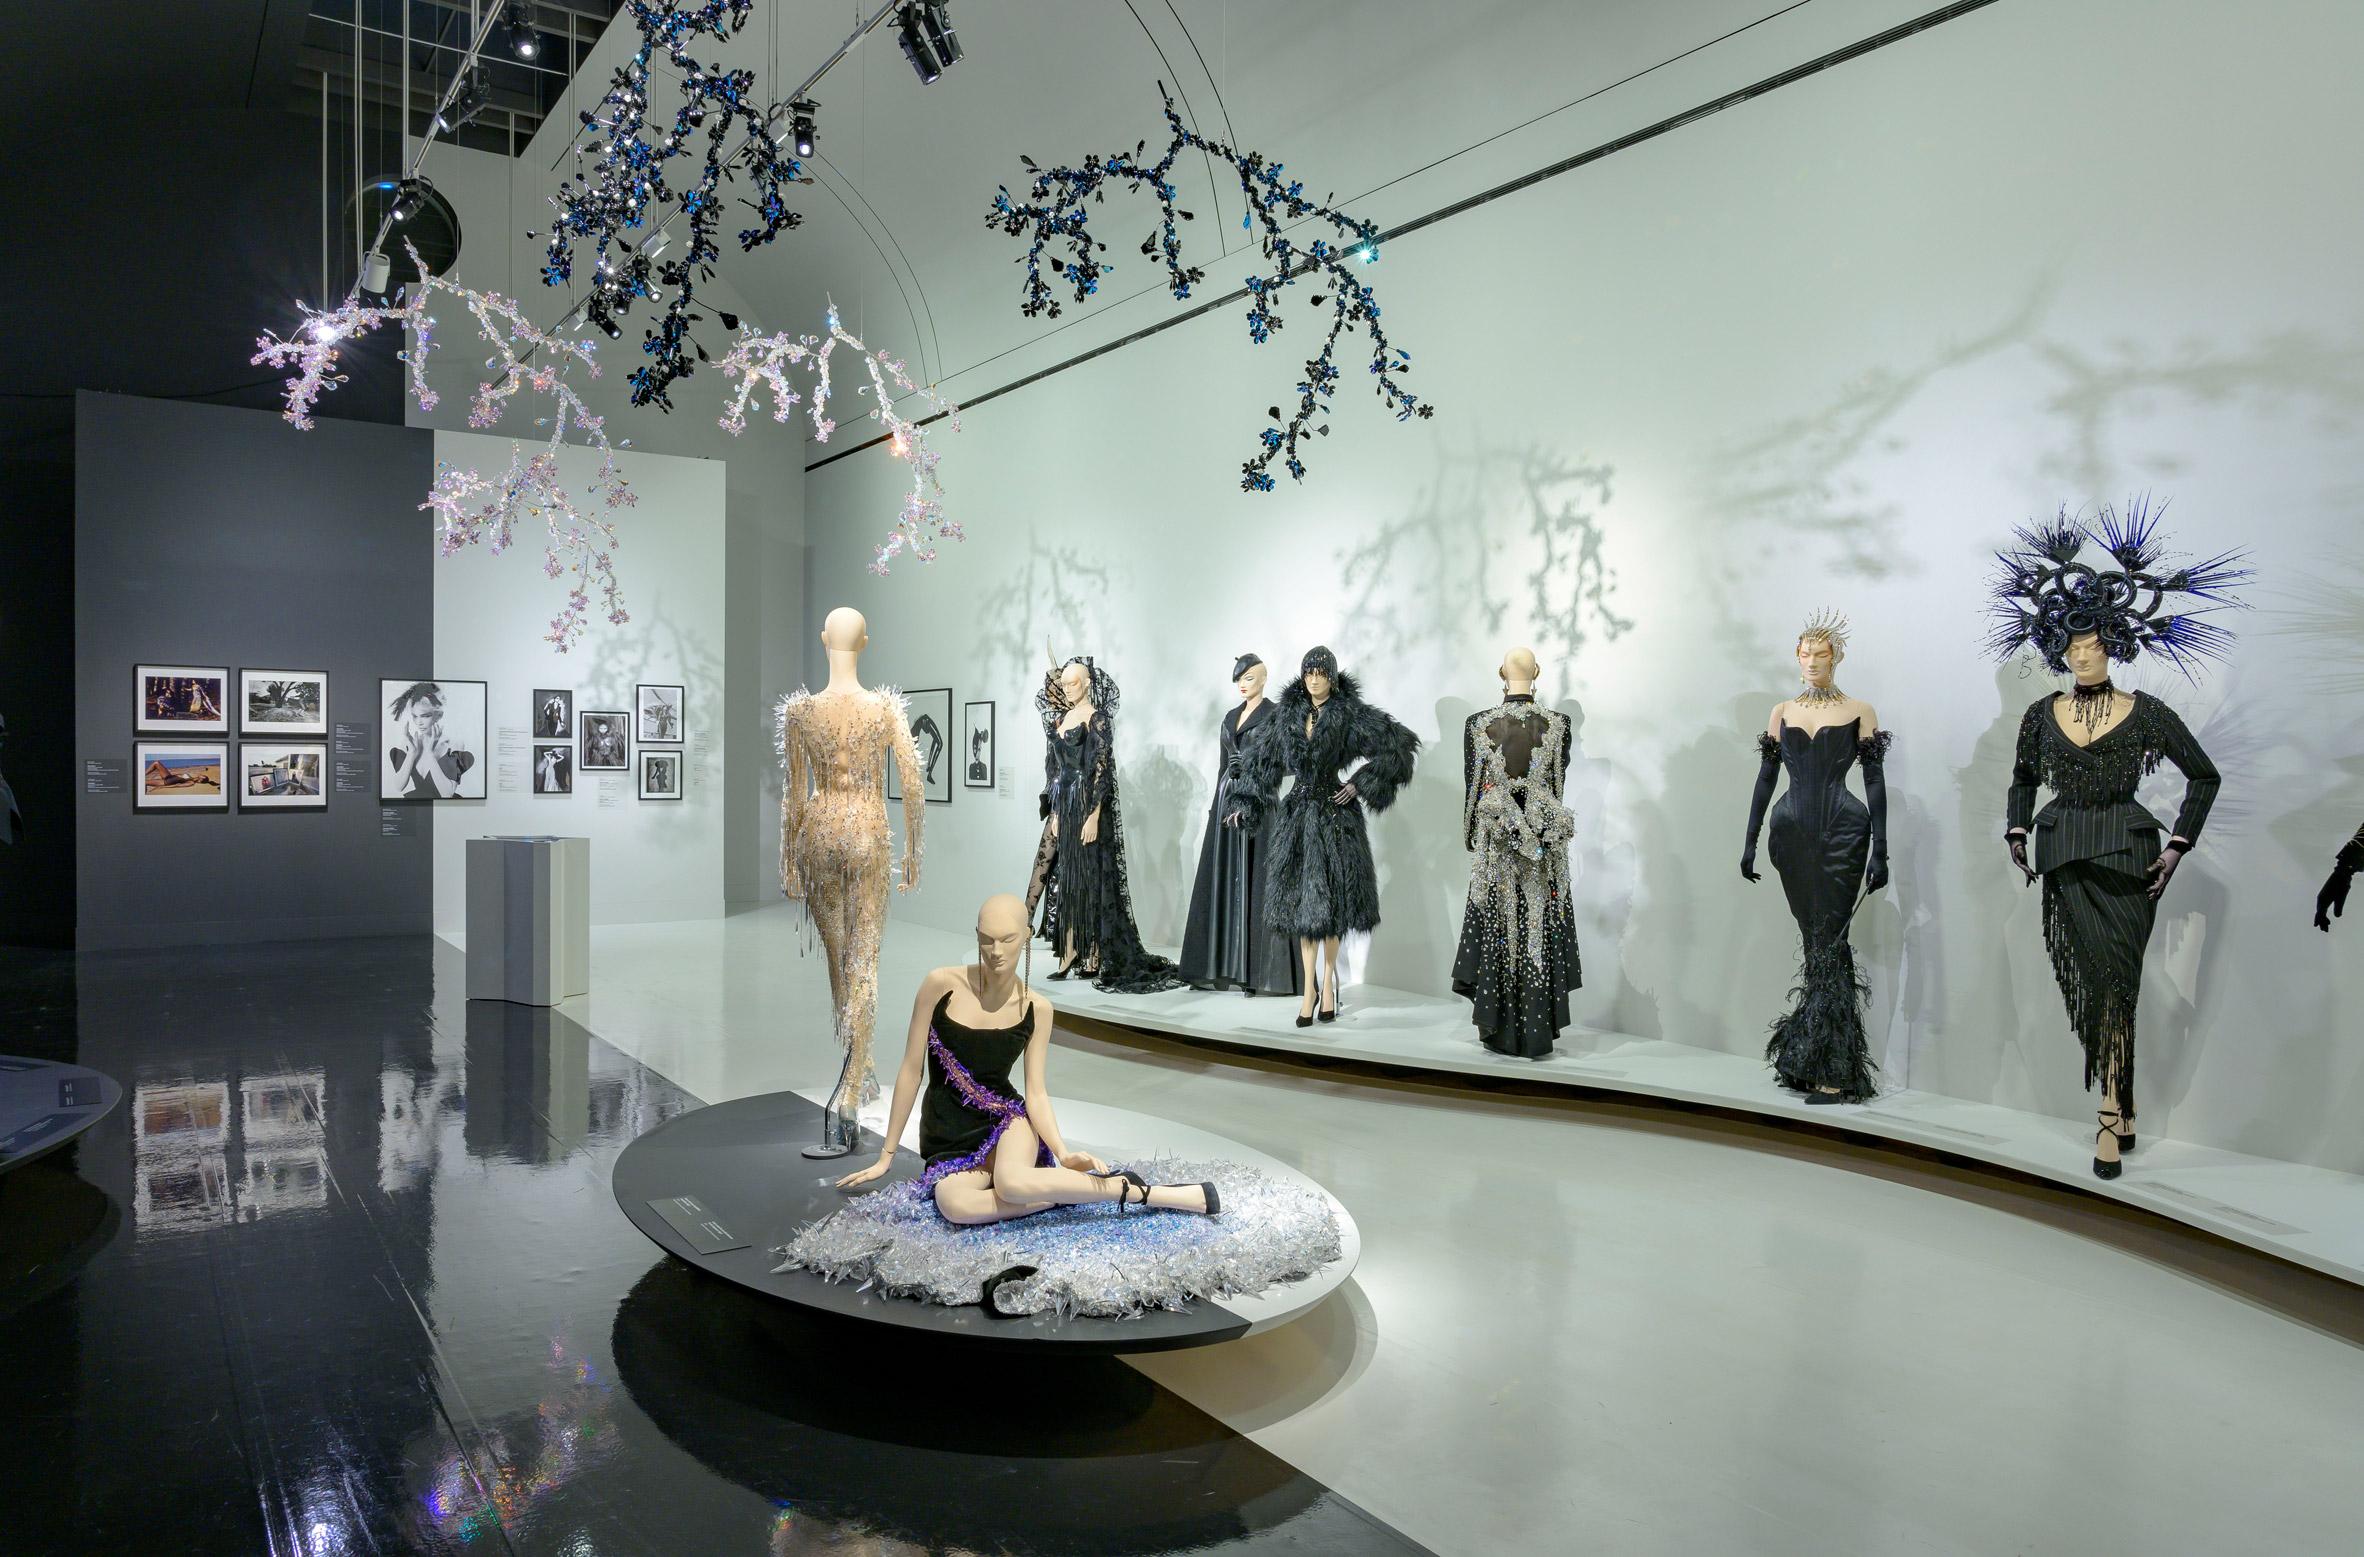 Couturissme exhibit by Thierry Mugler